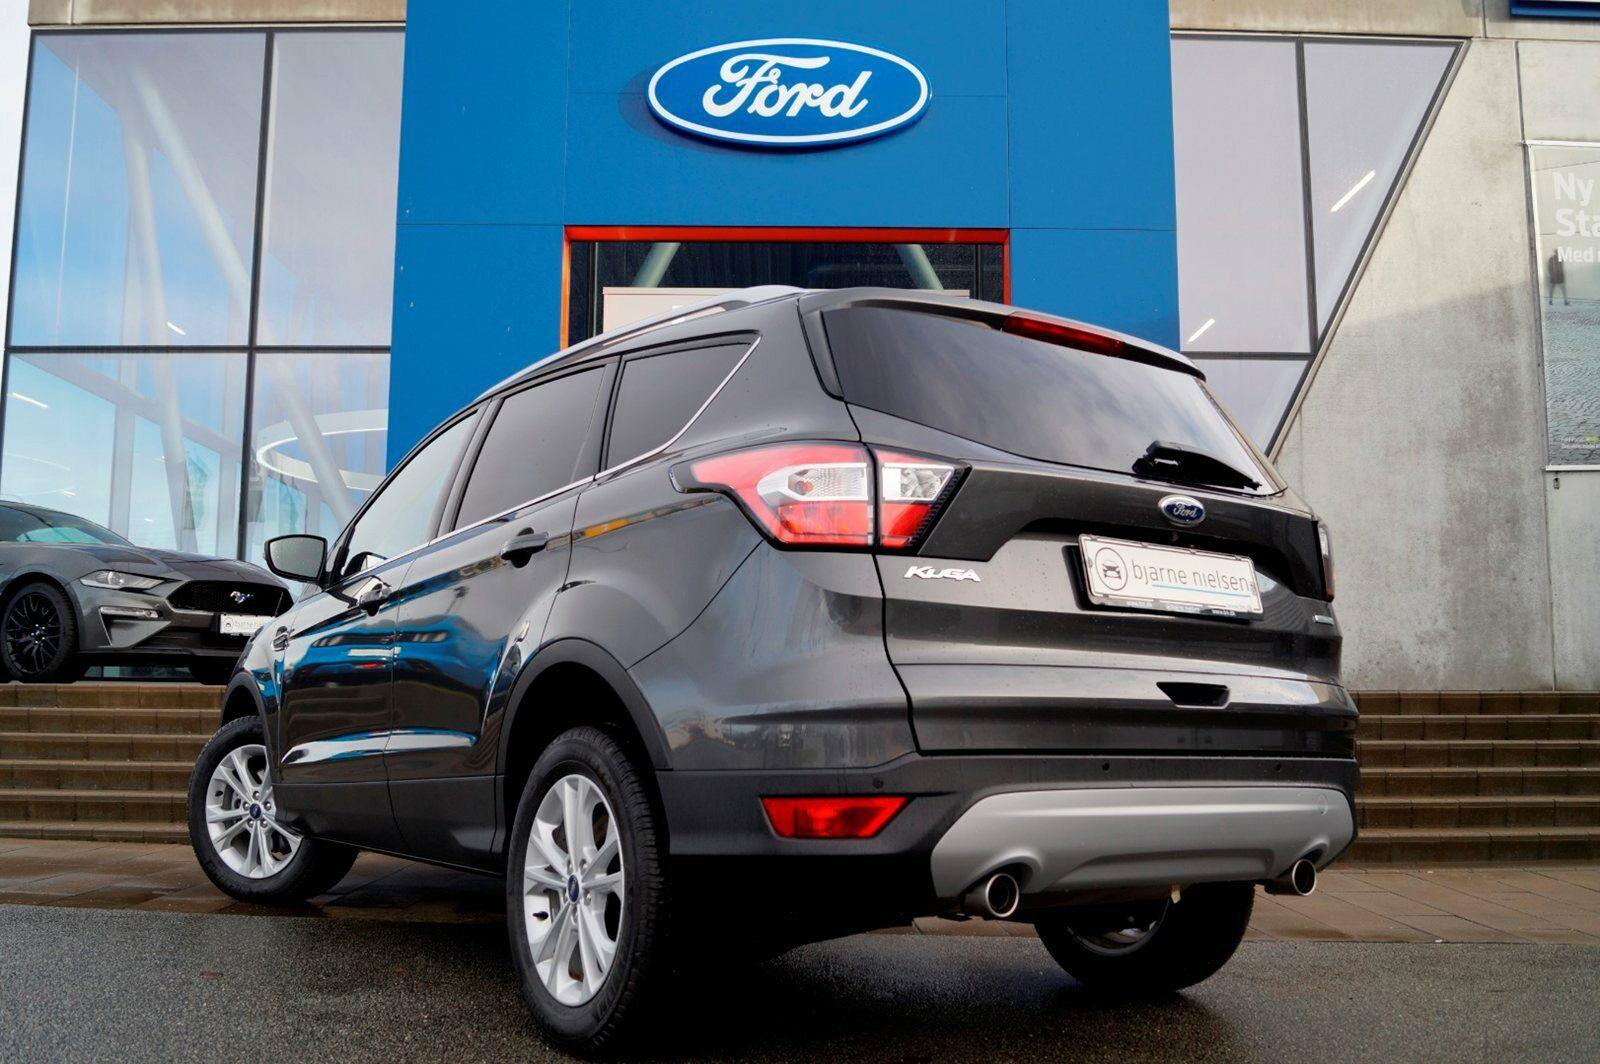 Ford Kuga 2,0 TDCi 150 Titanium - billede 3